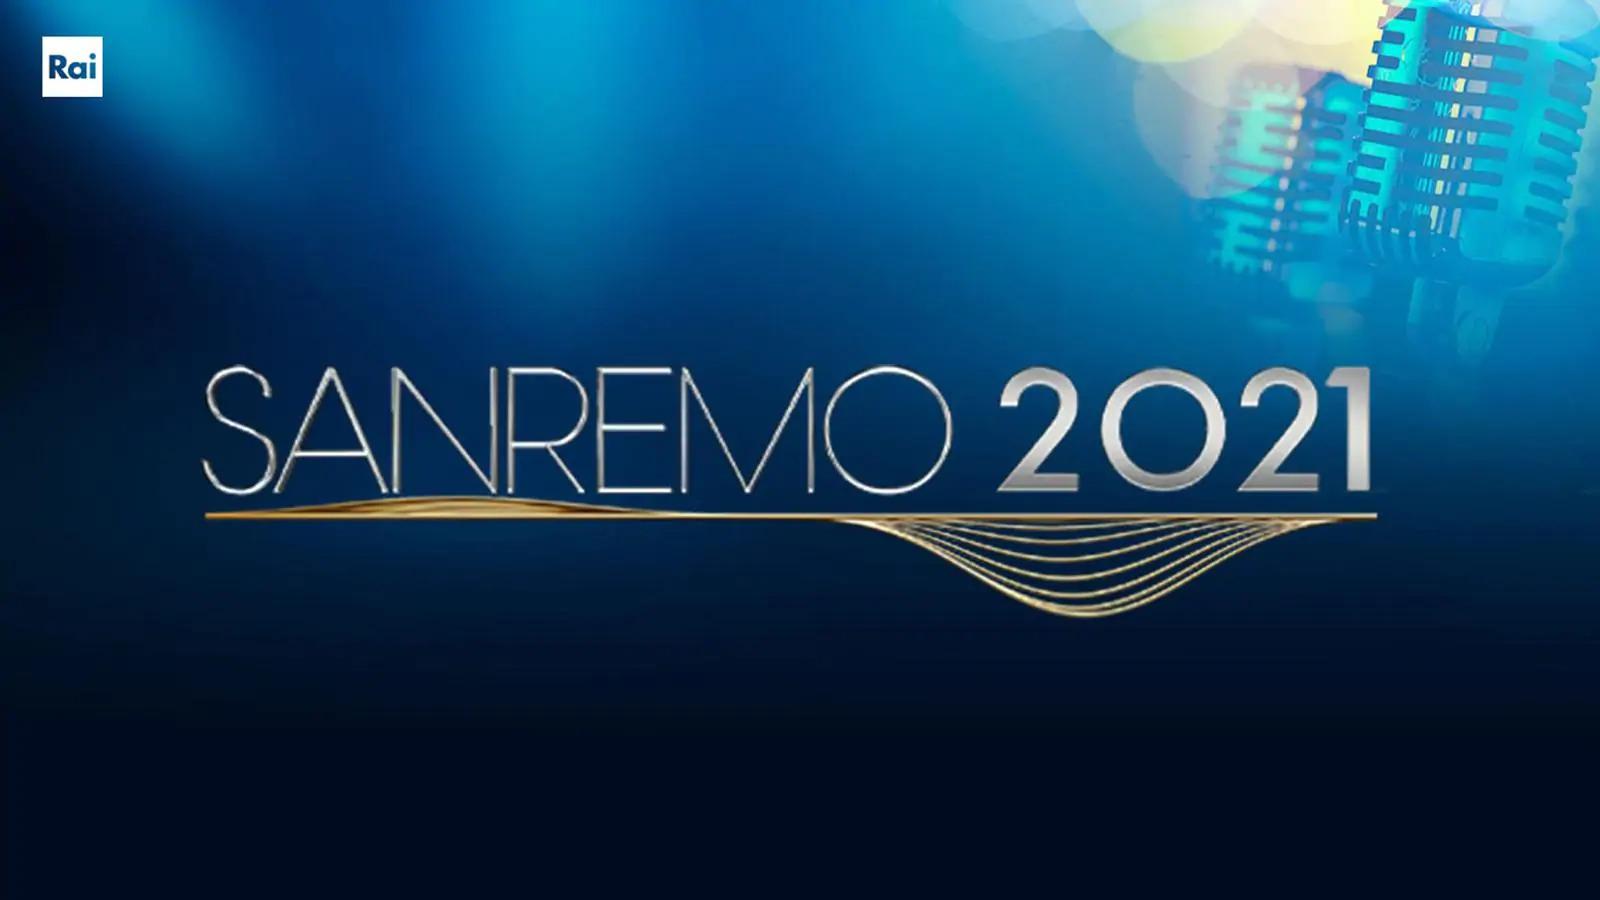 chi conduce Sanremo 2021